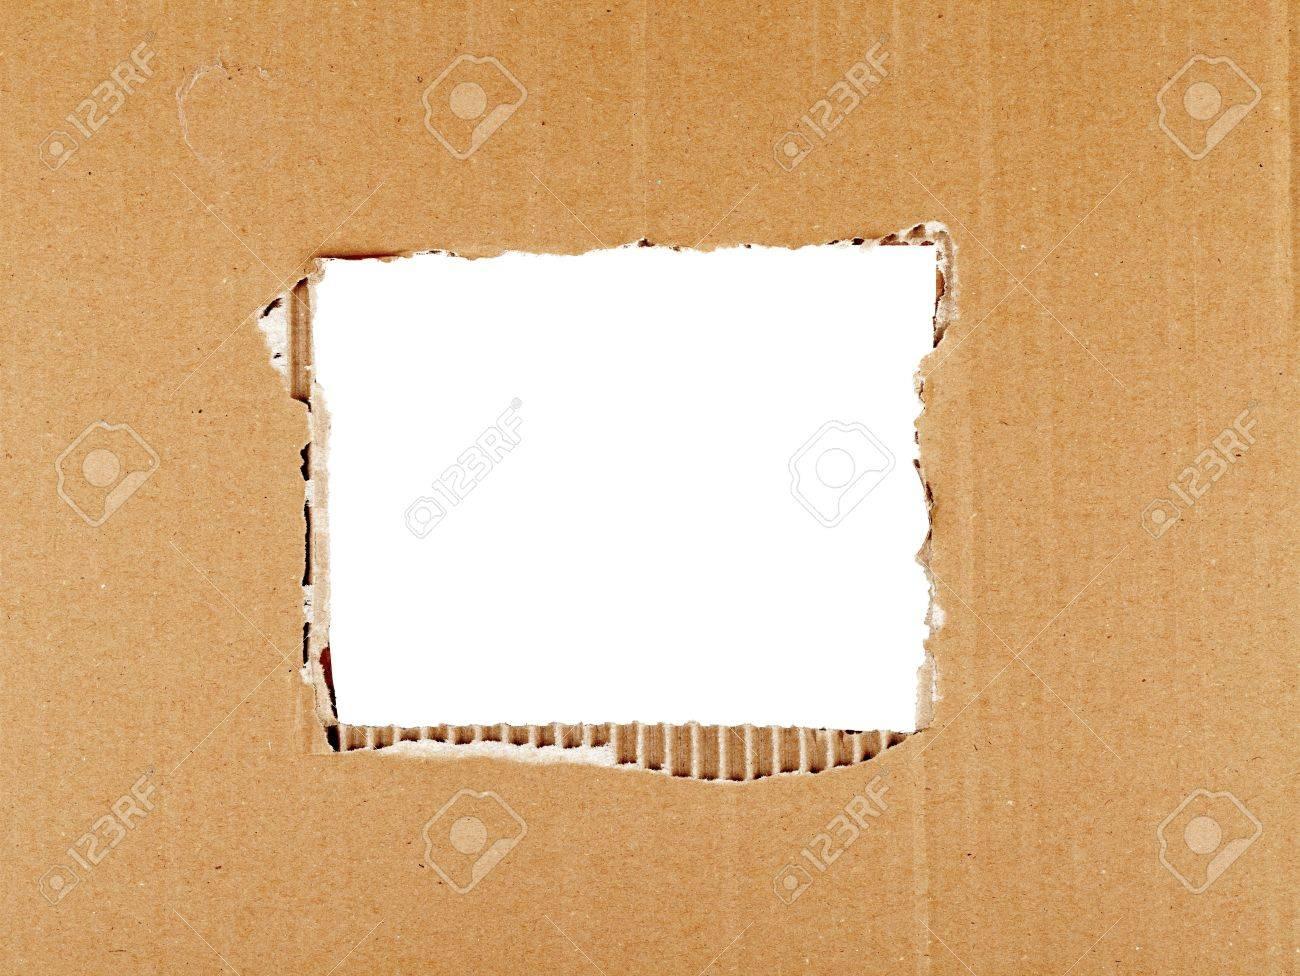 Cartón Rasgado Con Agujero Cuadrado Marco Formando Fotos, Retratos ...